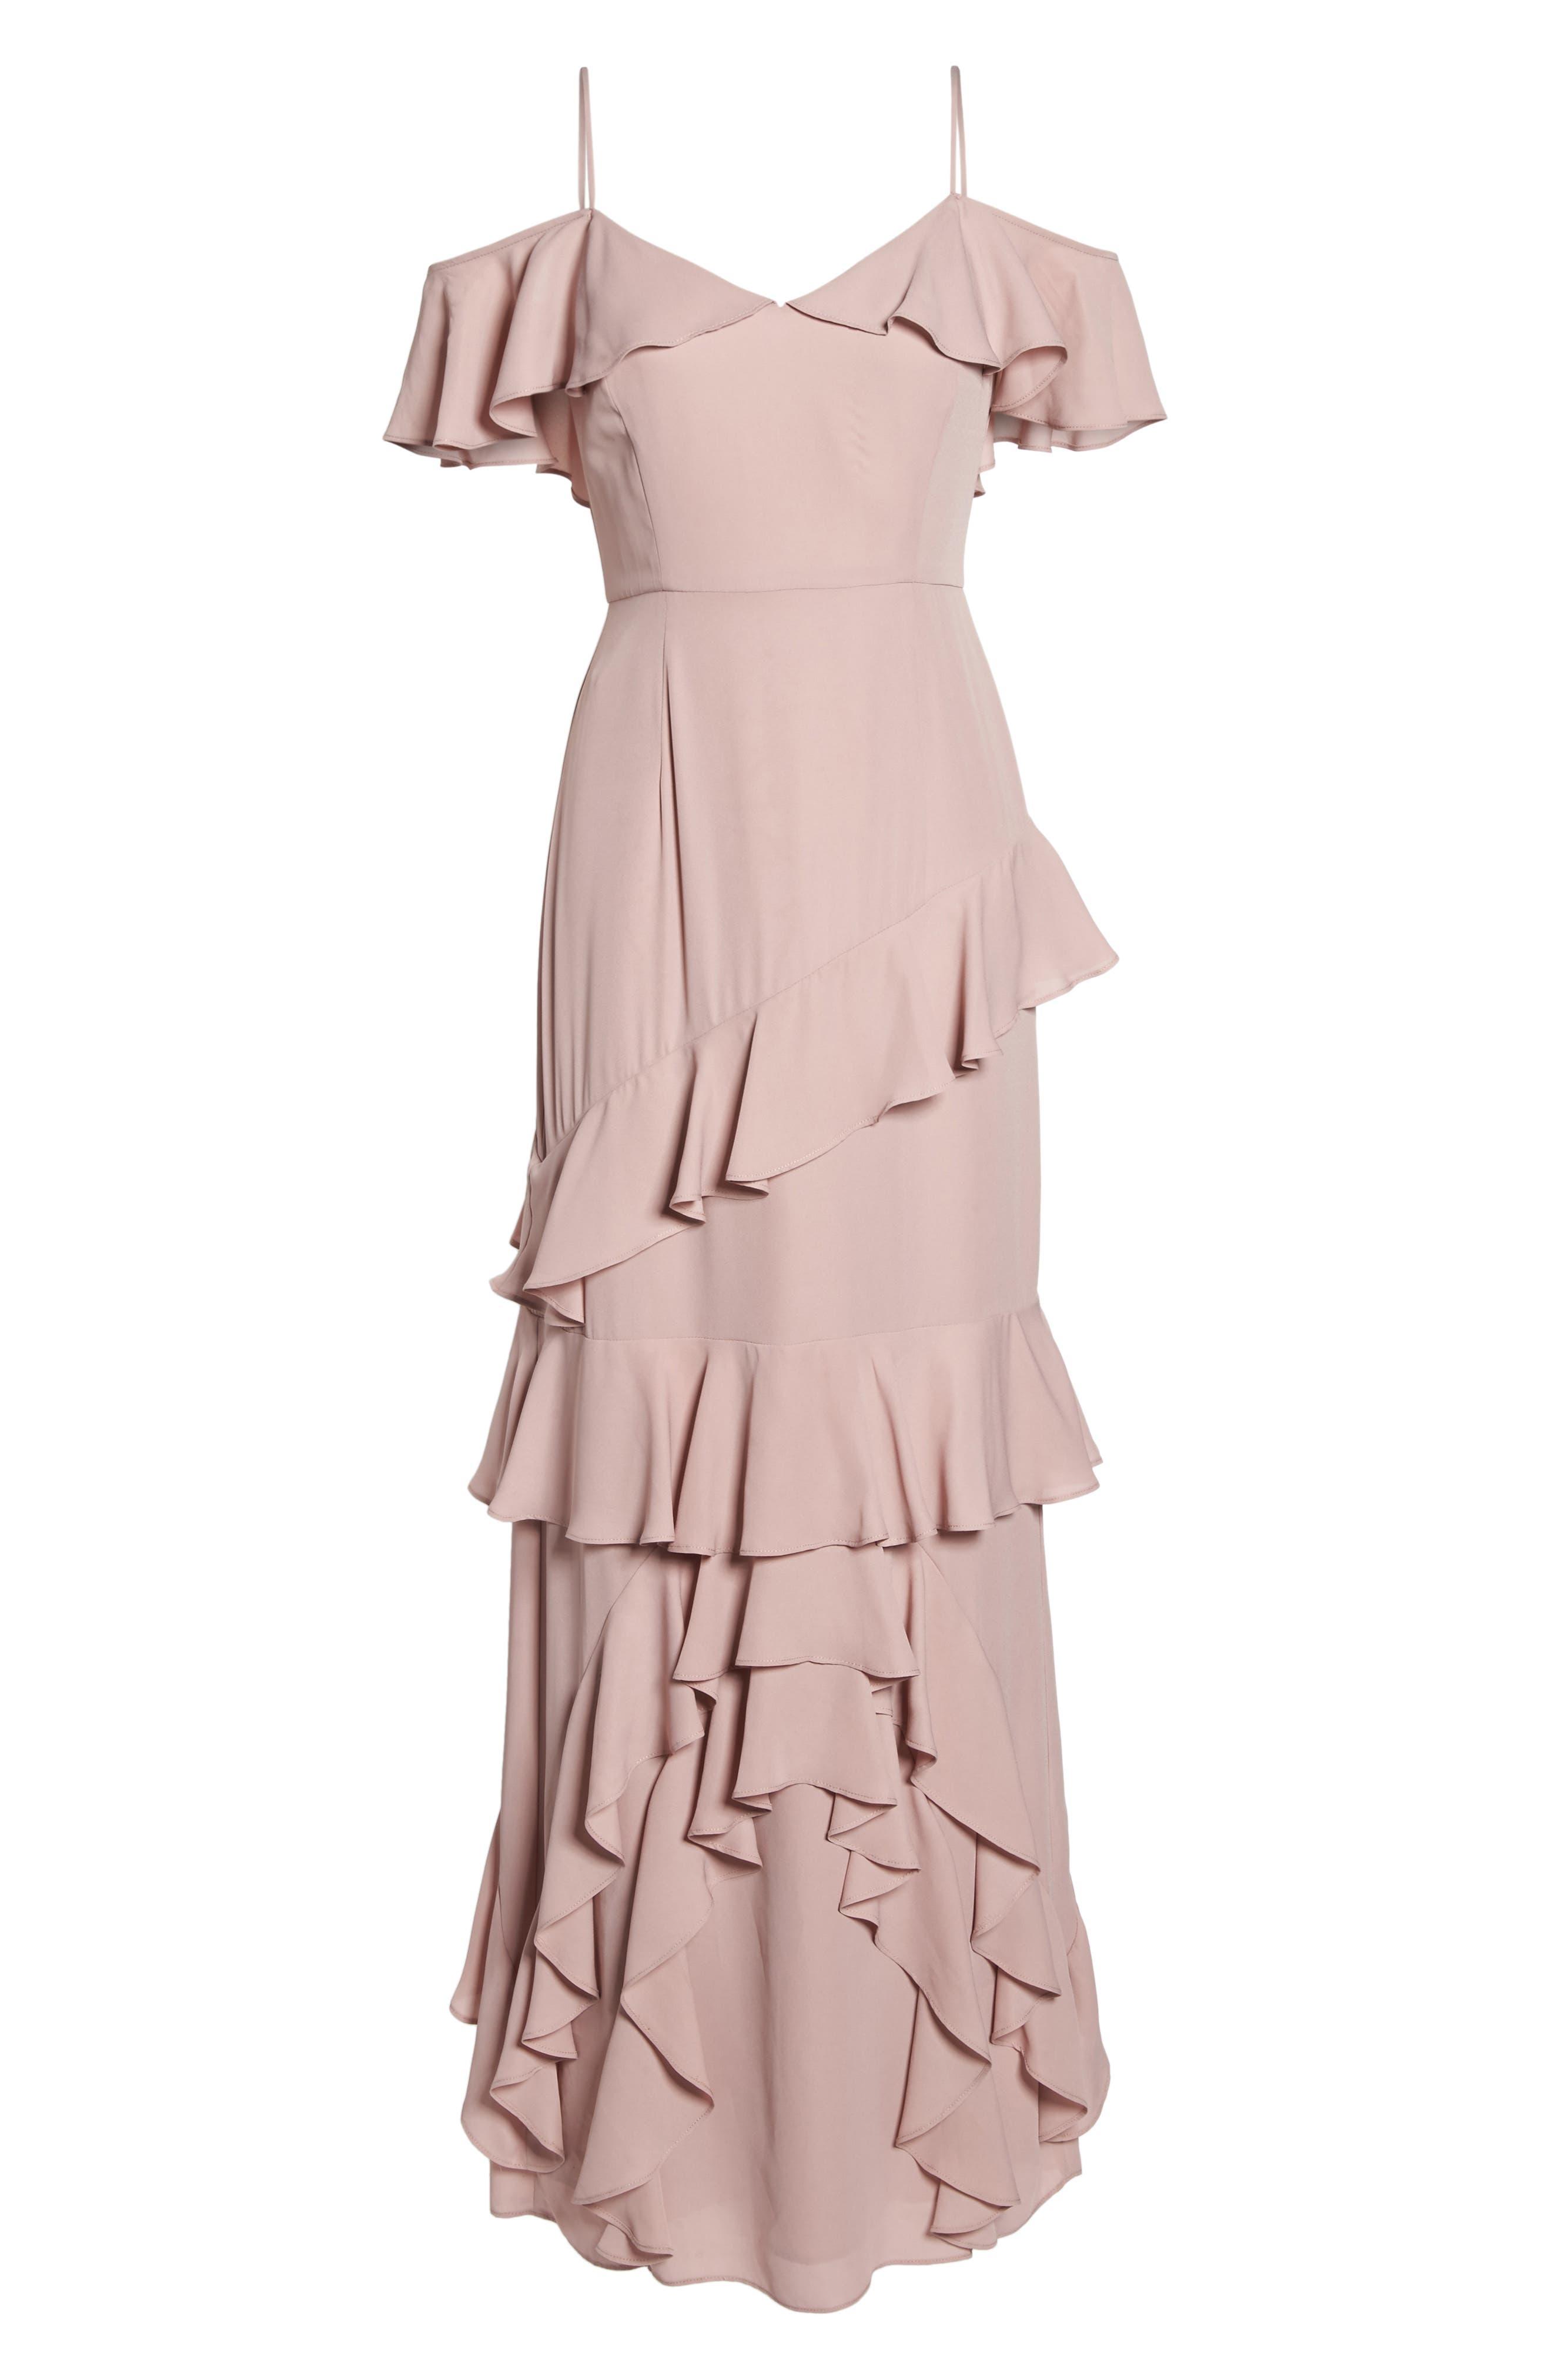 Danielle Off the Shoulder Tiered Crepe Dress,                             Alternate thumbnail 7, color,                             London Fog